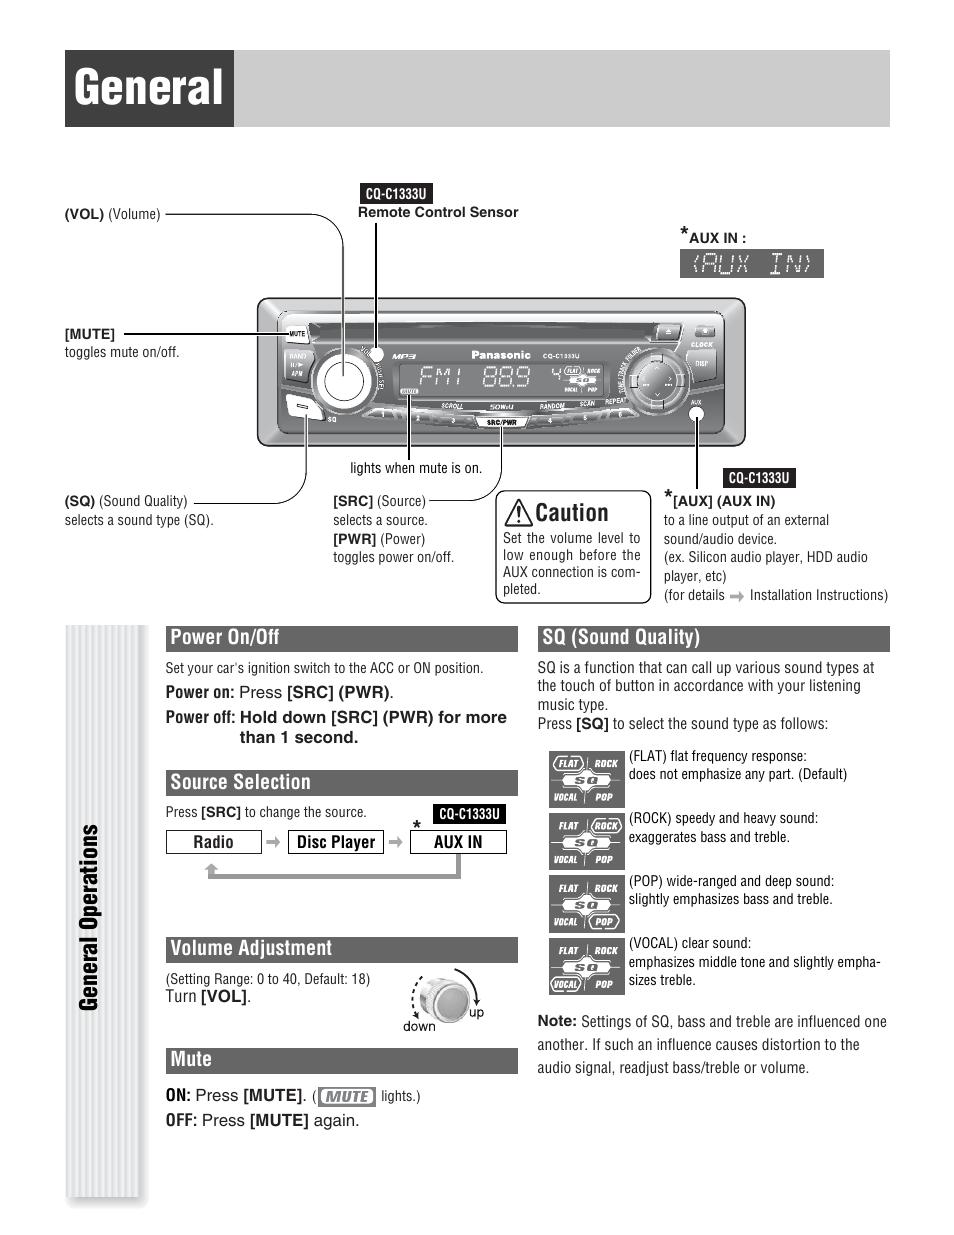 medium resolution of panasonic cq c u wiring diagram on panasonic car radio manuals panasonic car stereo auto